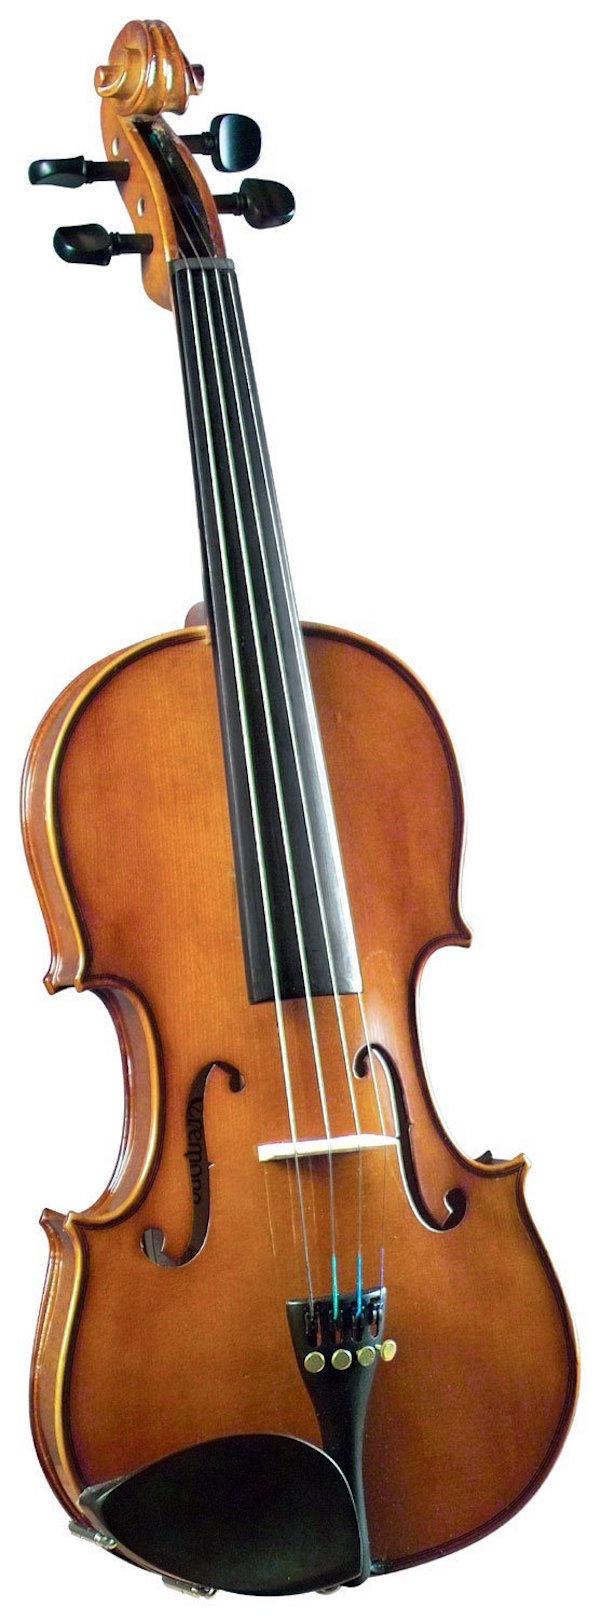 Cremona SV-130 4/4 Violin with Premium Strings